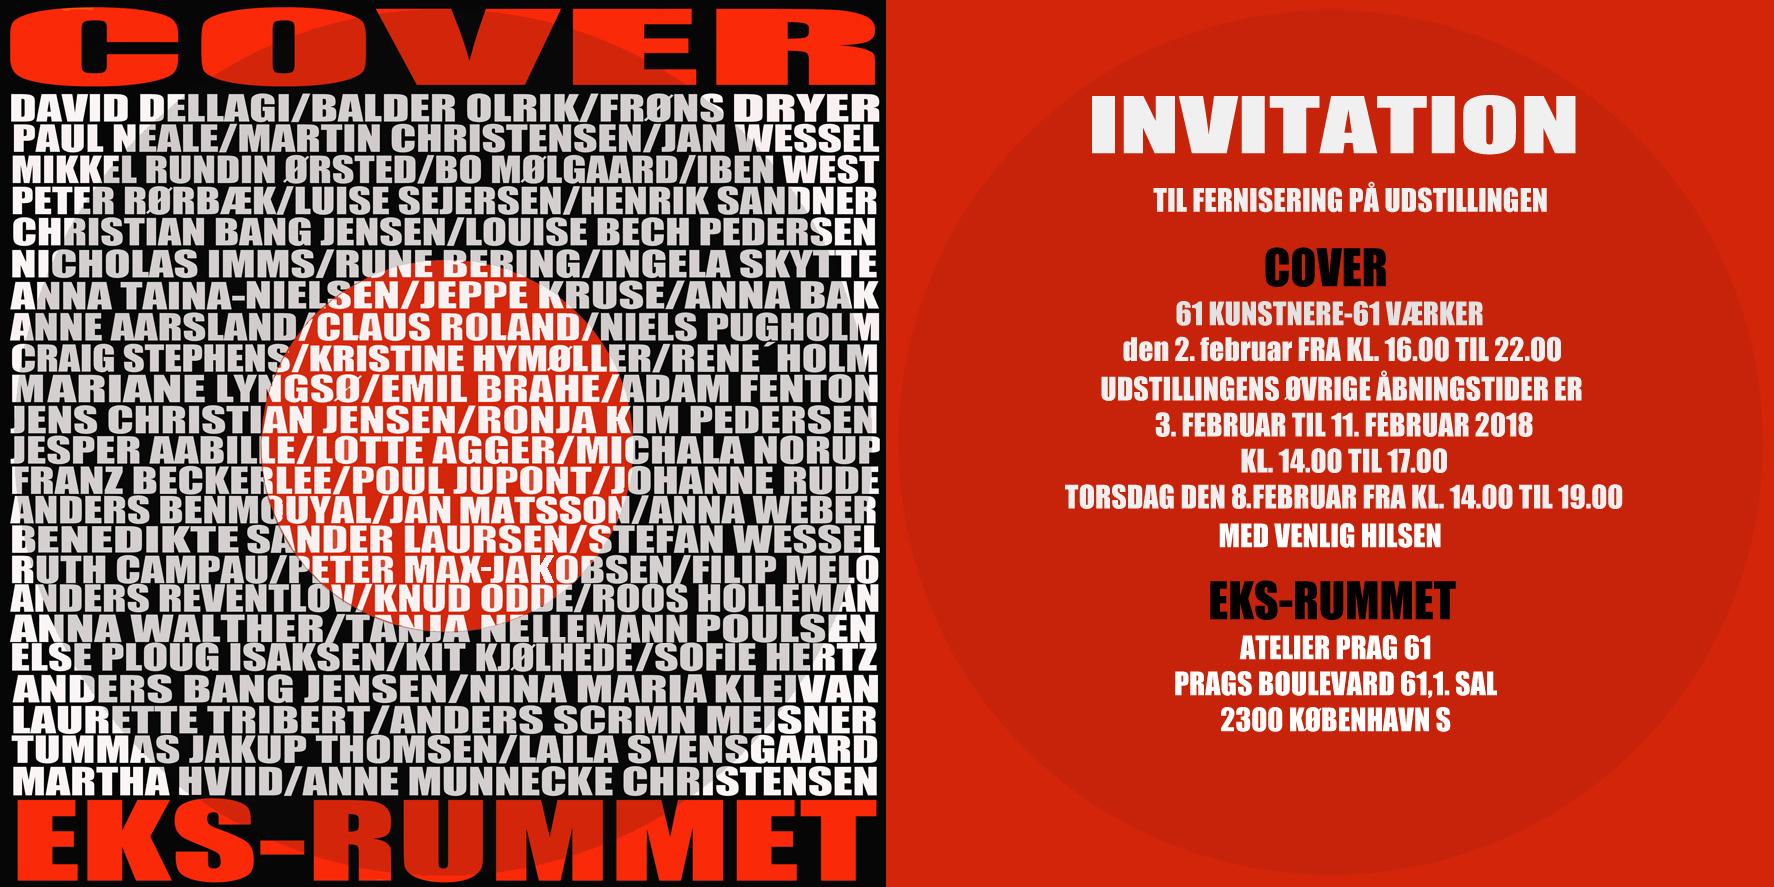 INVITATION COVER 3.jpg